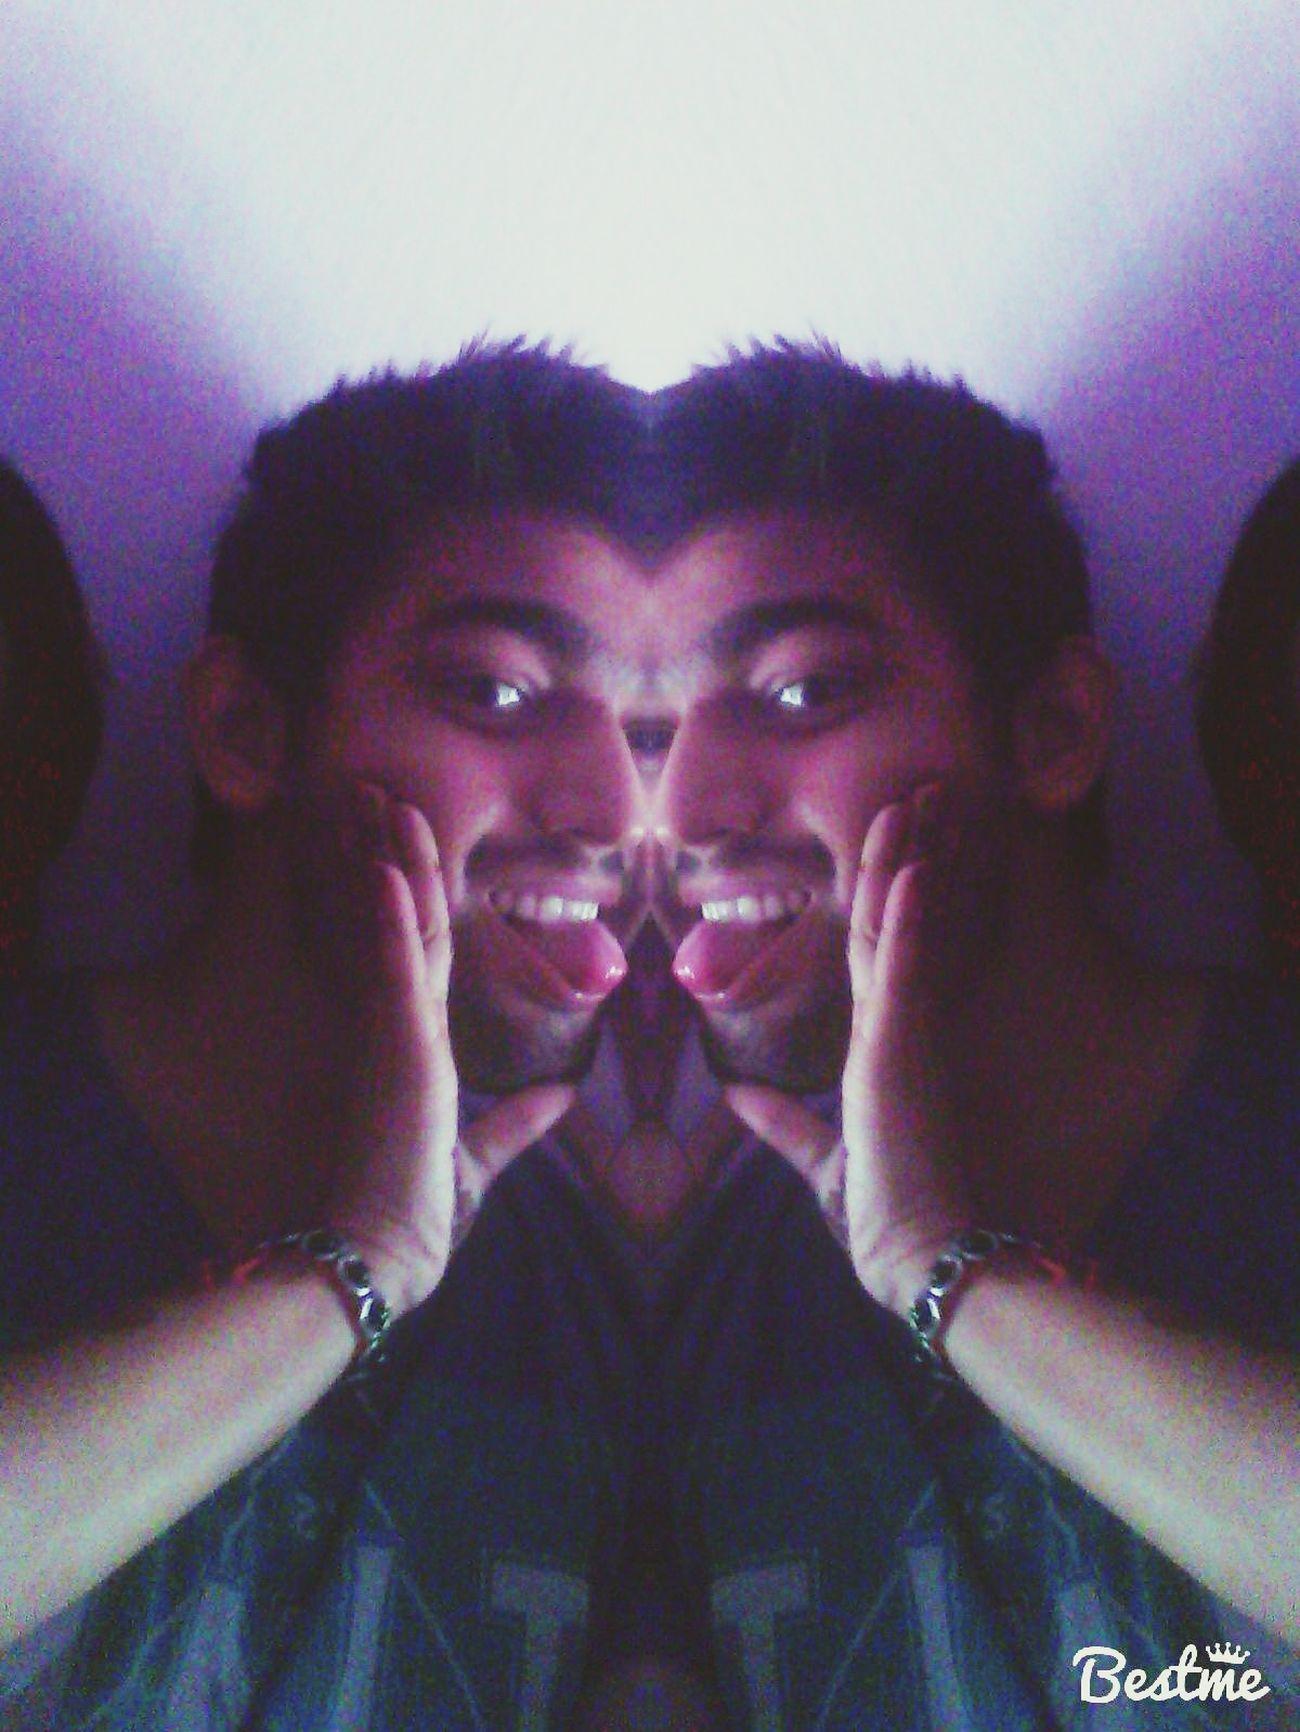 Its Me :) Click Click 📷📷📷 Selfietime Enjoying Clicking 📷📷 Love U World💕💕 Just Chillin'